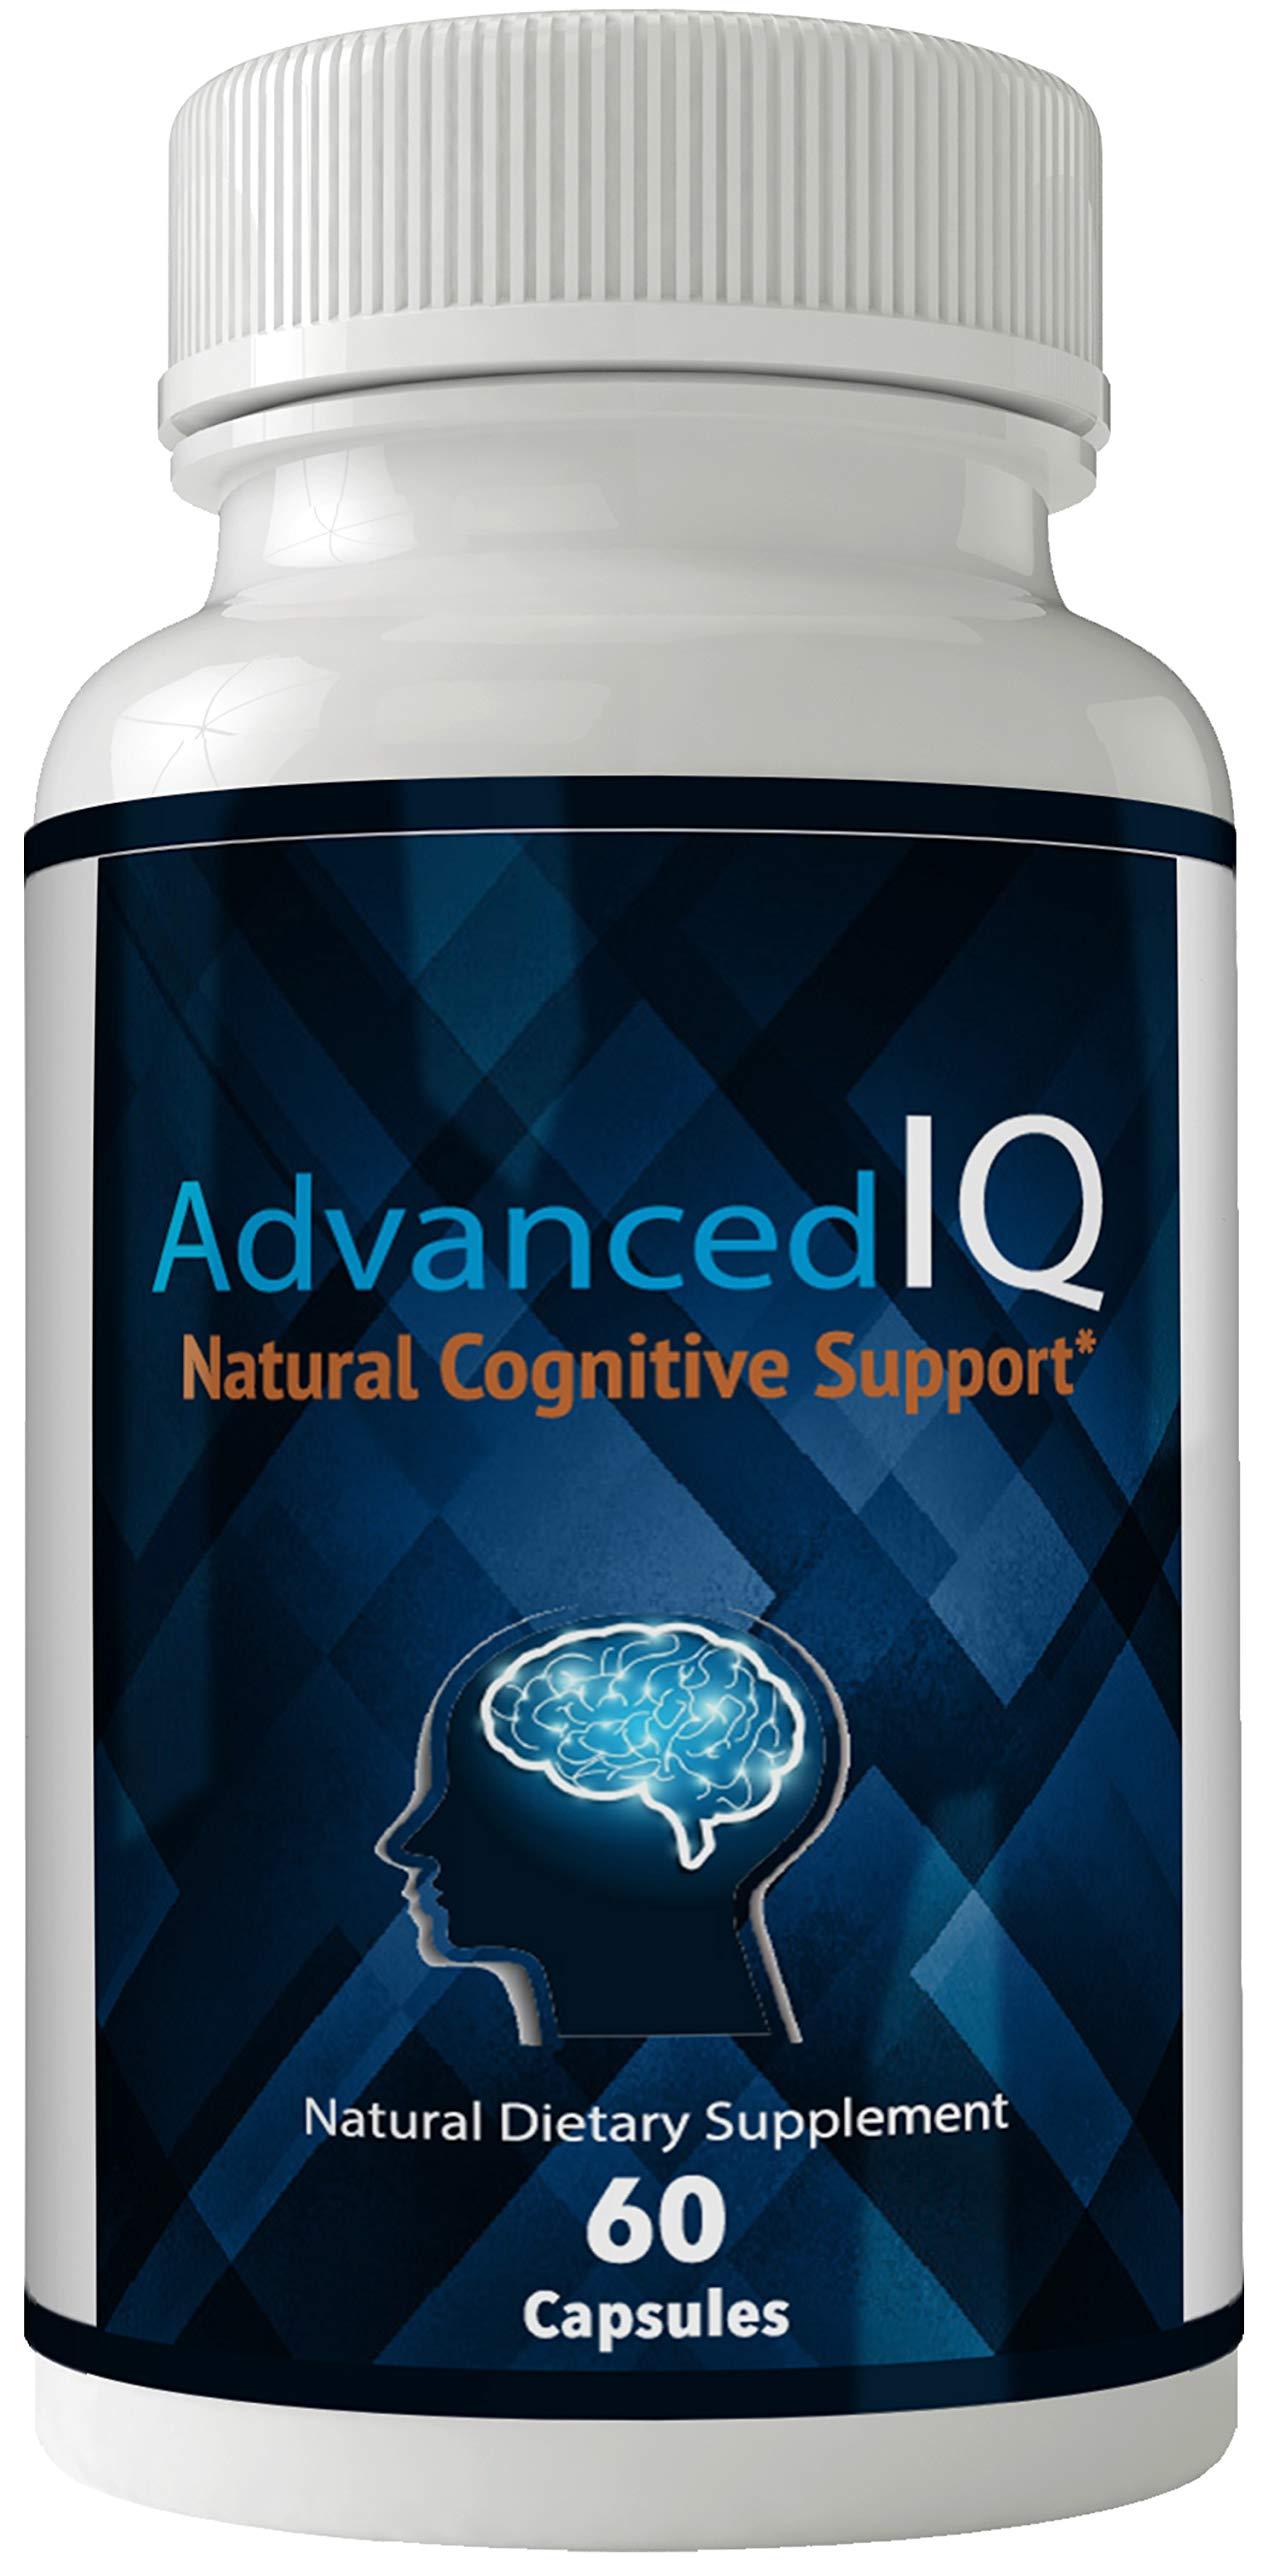 Advanced Iq Brain Enhancement - Advanced IQ Plus Brain Supplement - Advanced IQ Plus Pills Supplement - Original Advanced IQ Optimal Cognitive Support - Mind IQ Plus Limitless Pill Tests